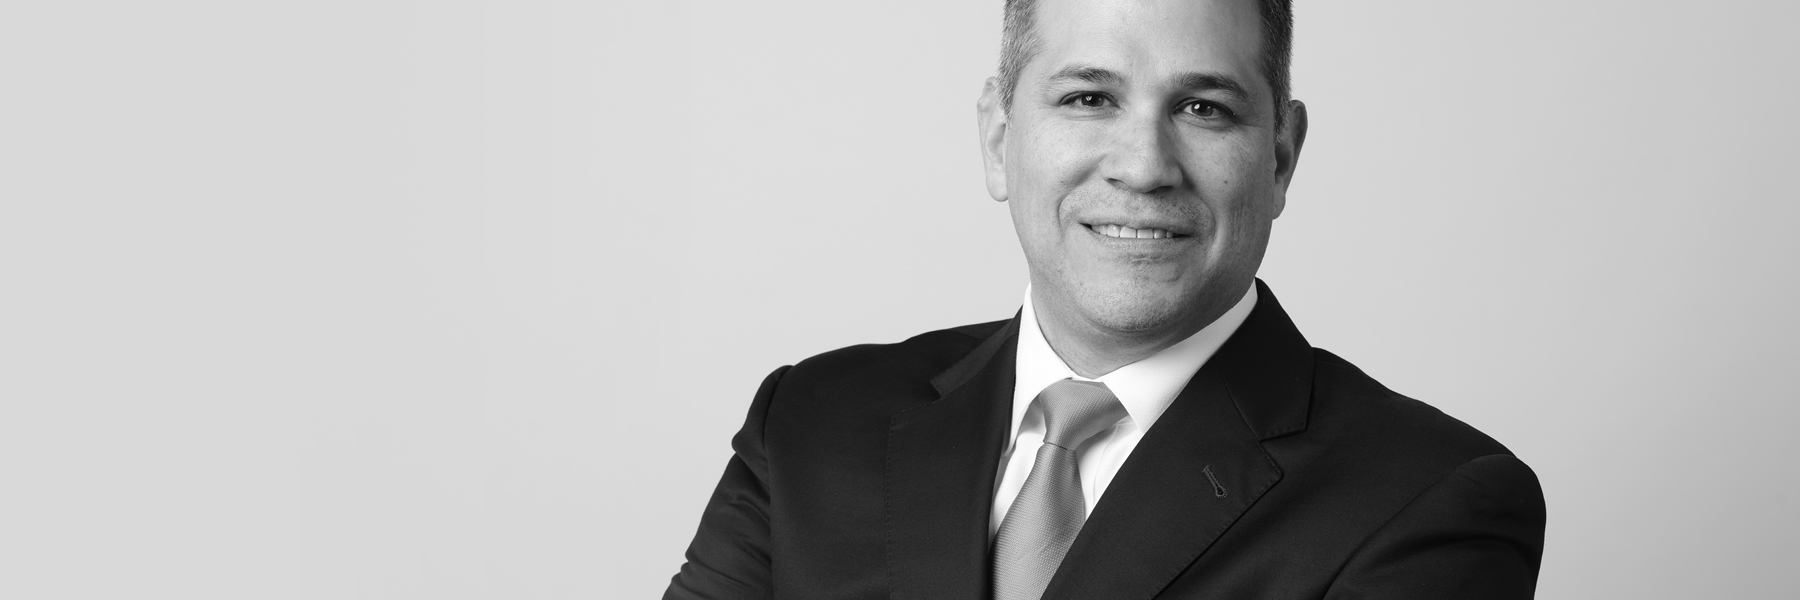 Jose_Ruiz_Executive_Search